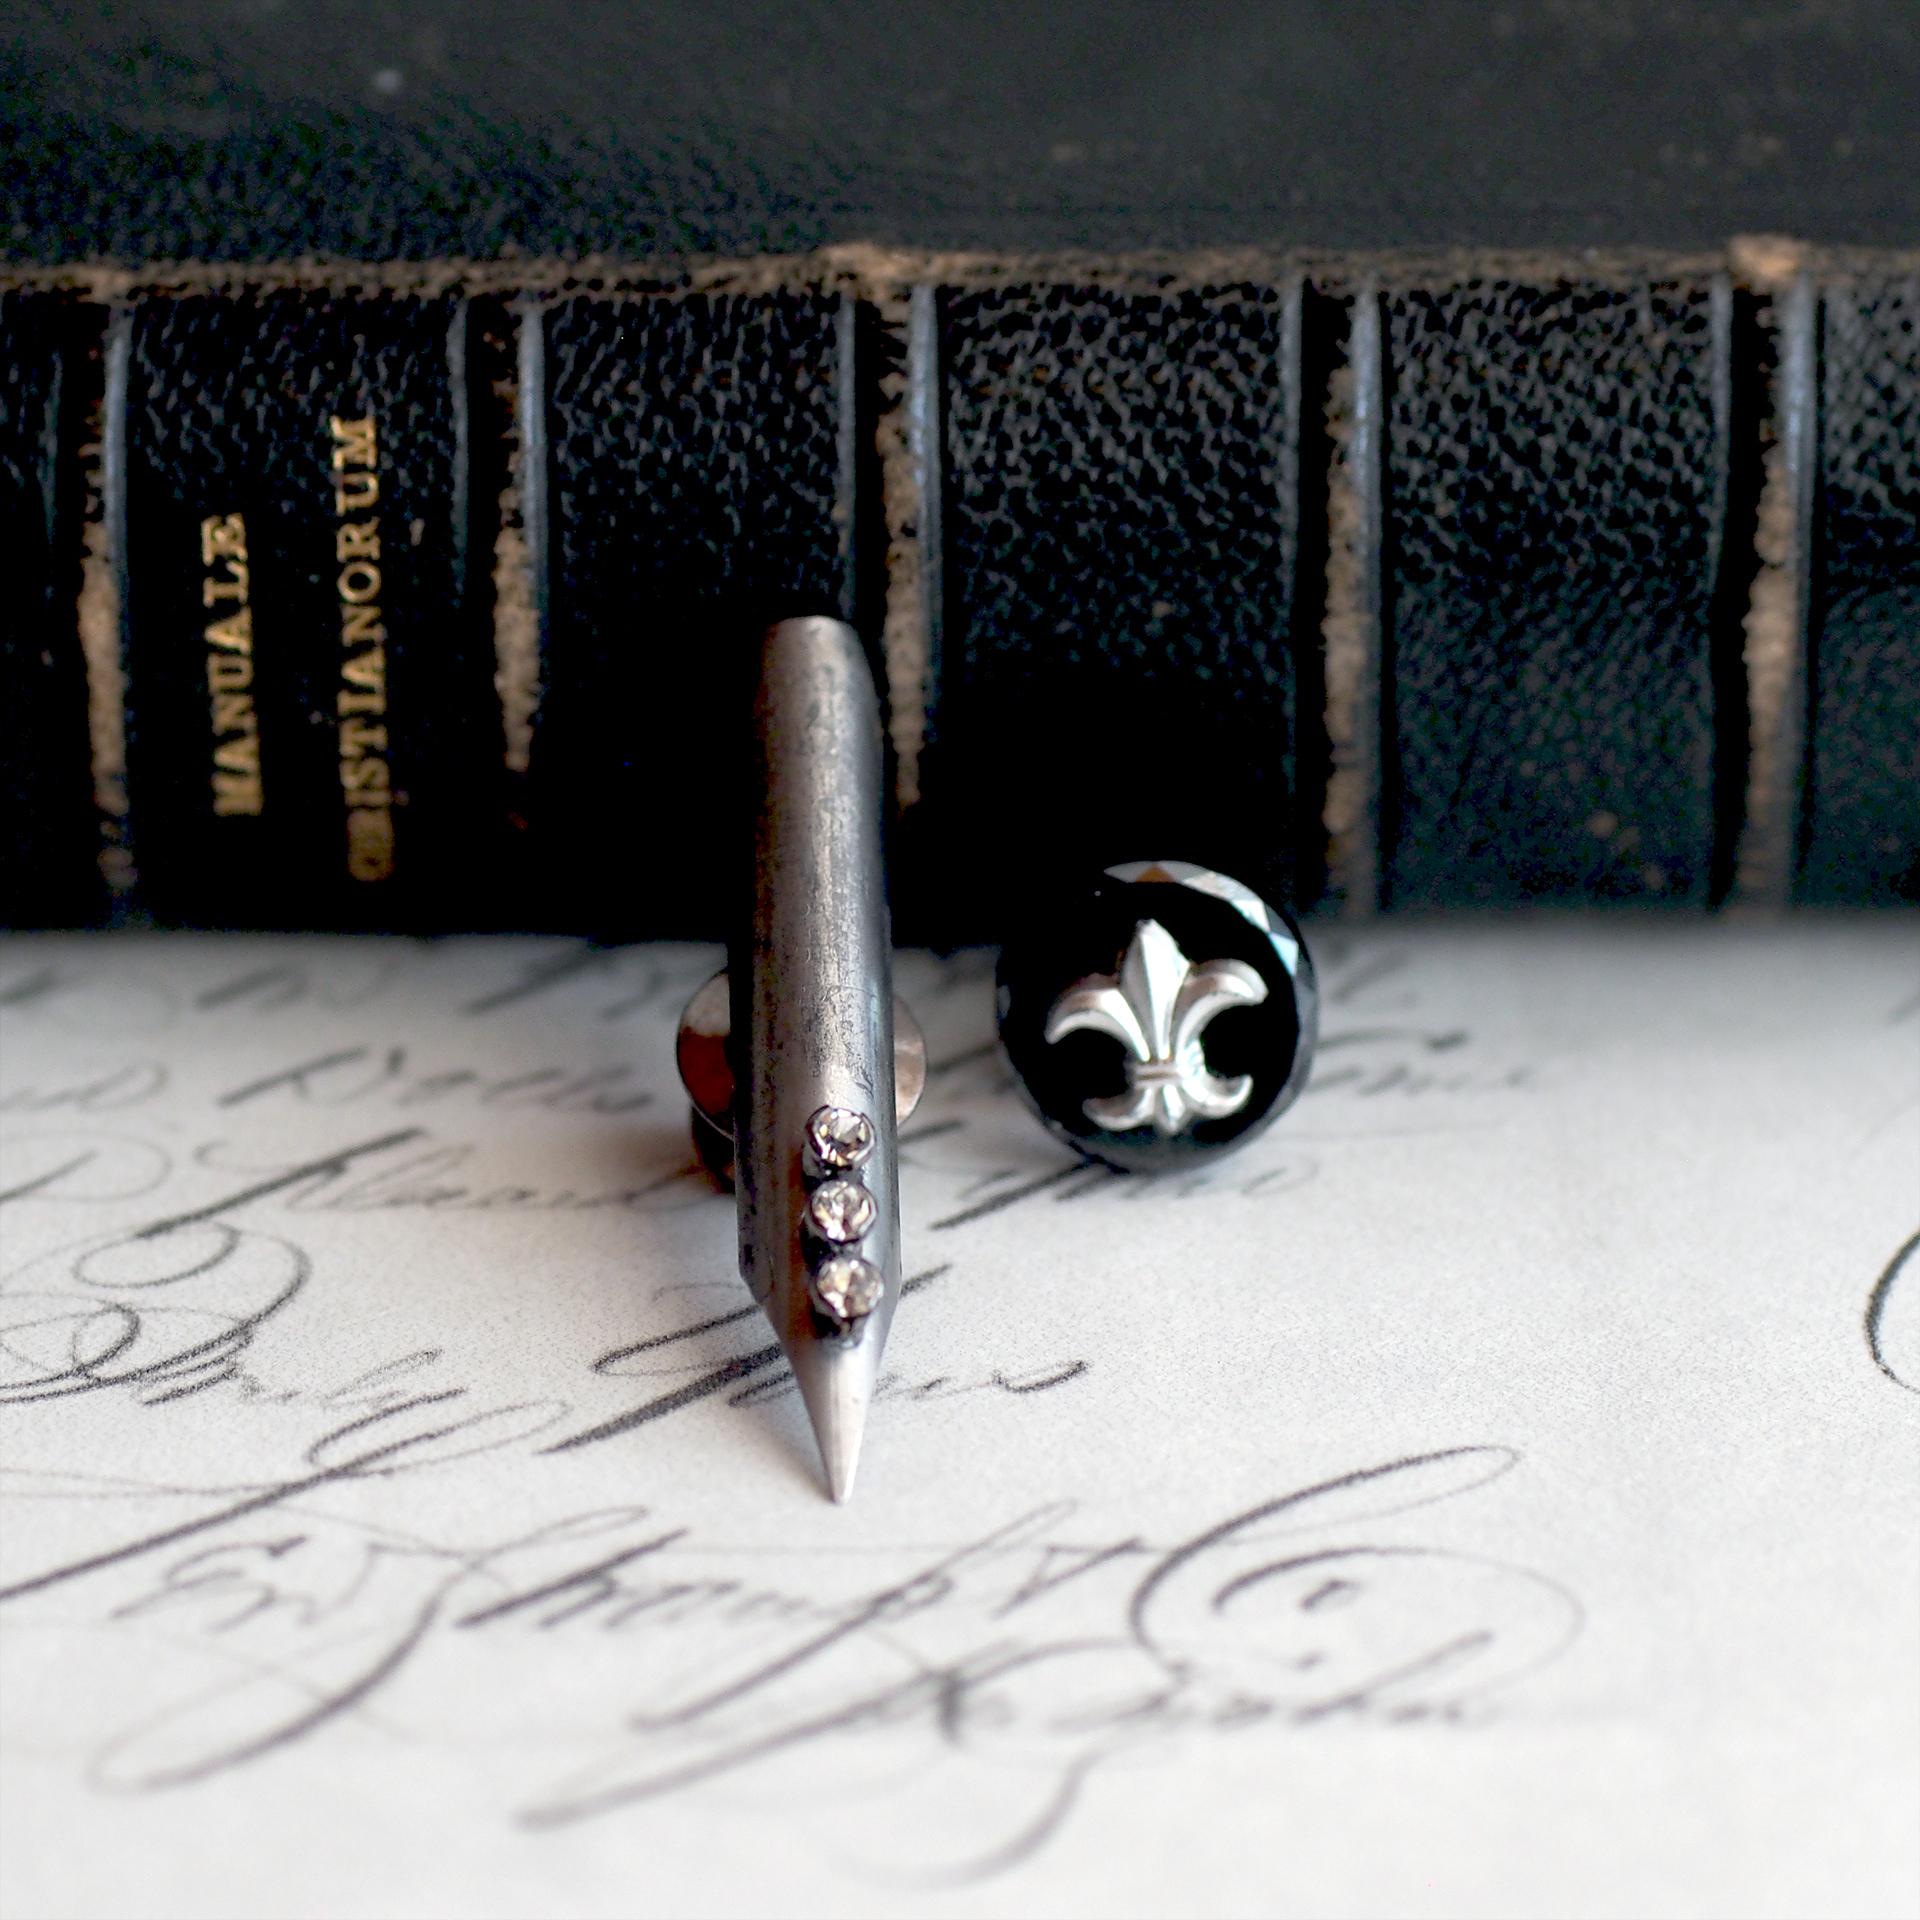 Re:novel - ペン先 - / ピンブローチ(ペンと盾 ユリの紋章)